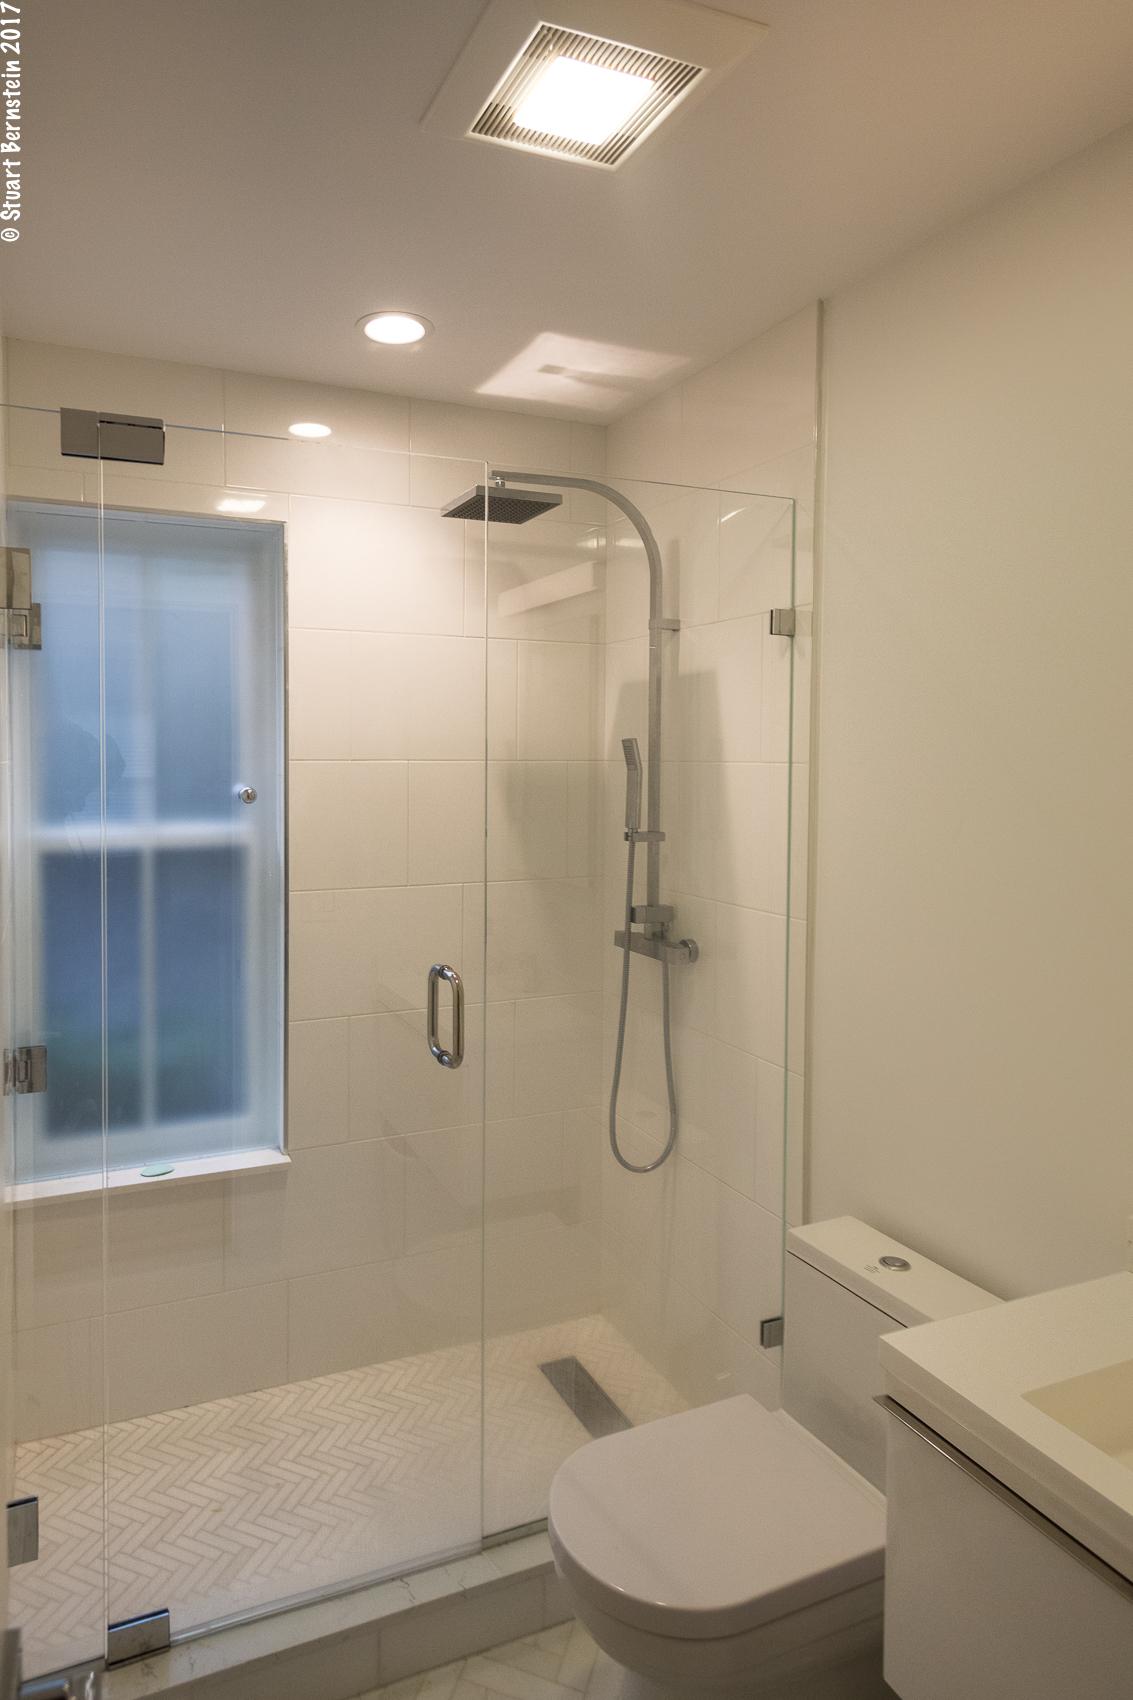 rain-shower-head-shower-remodel-ideas-beverly-godfrey-design-build.jpg